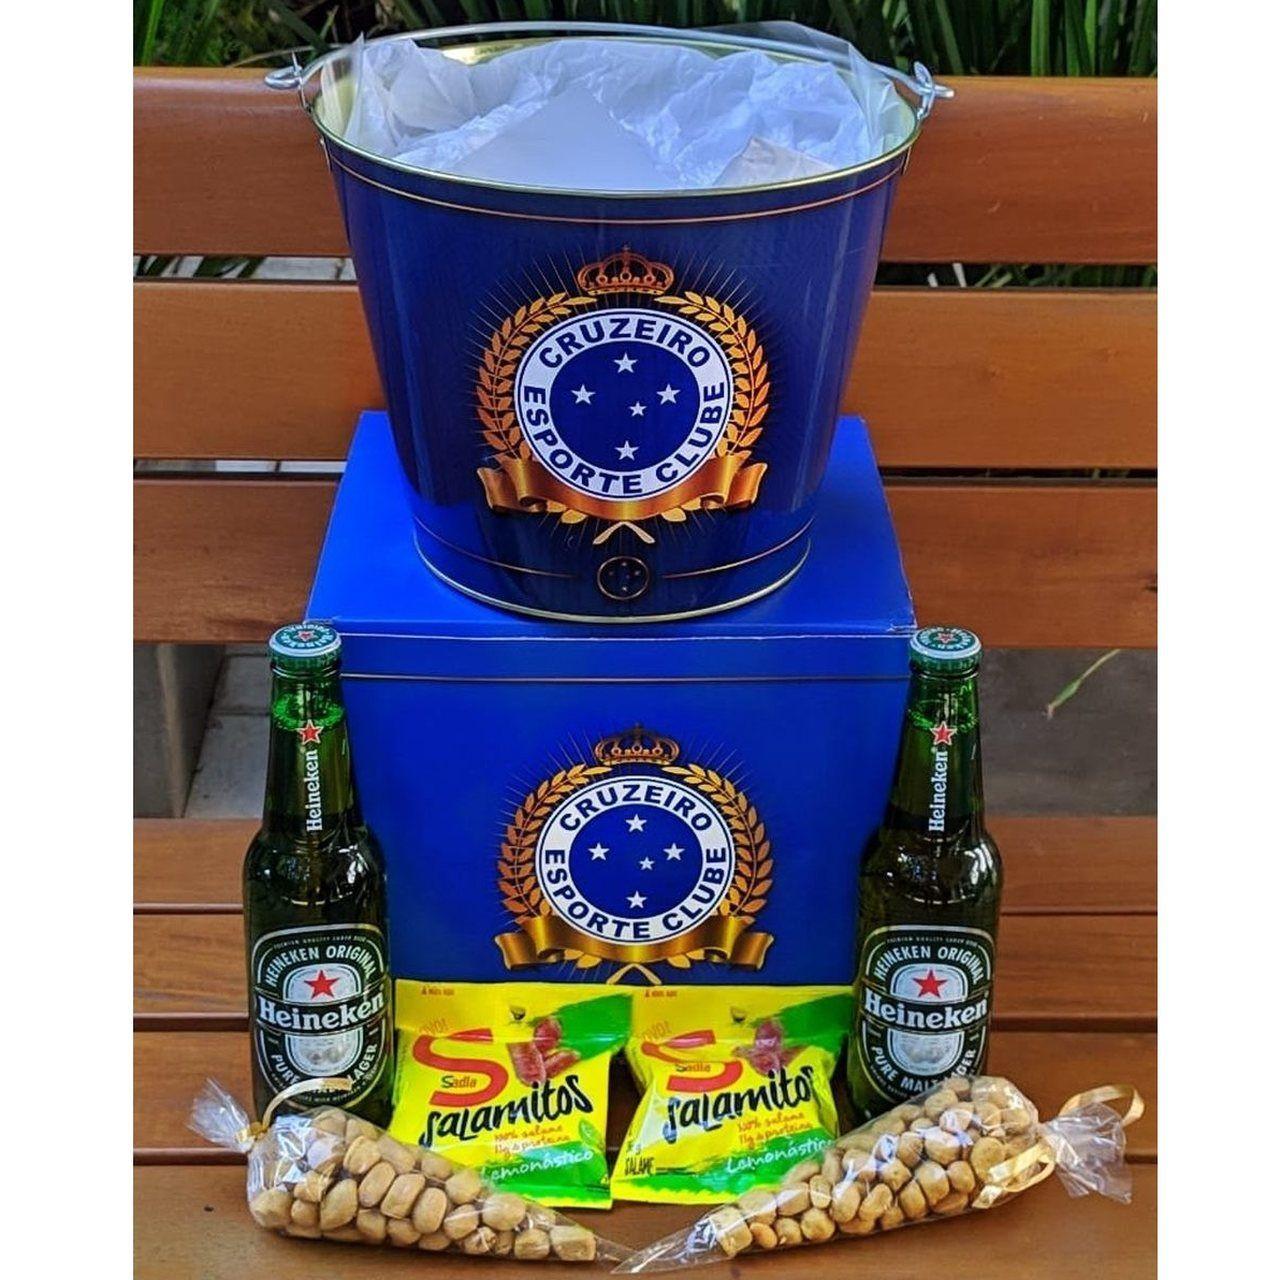 Happy Hour - Cruzeiro